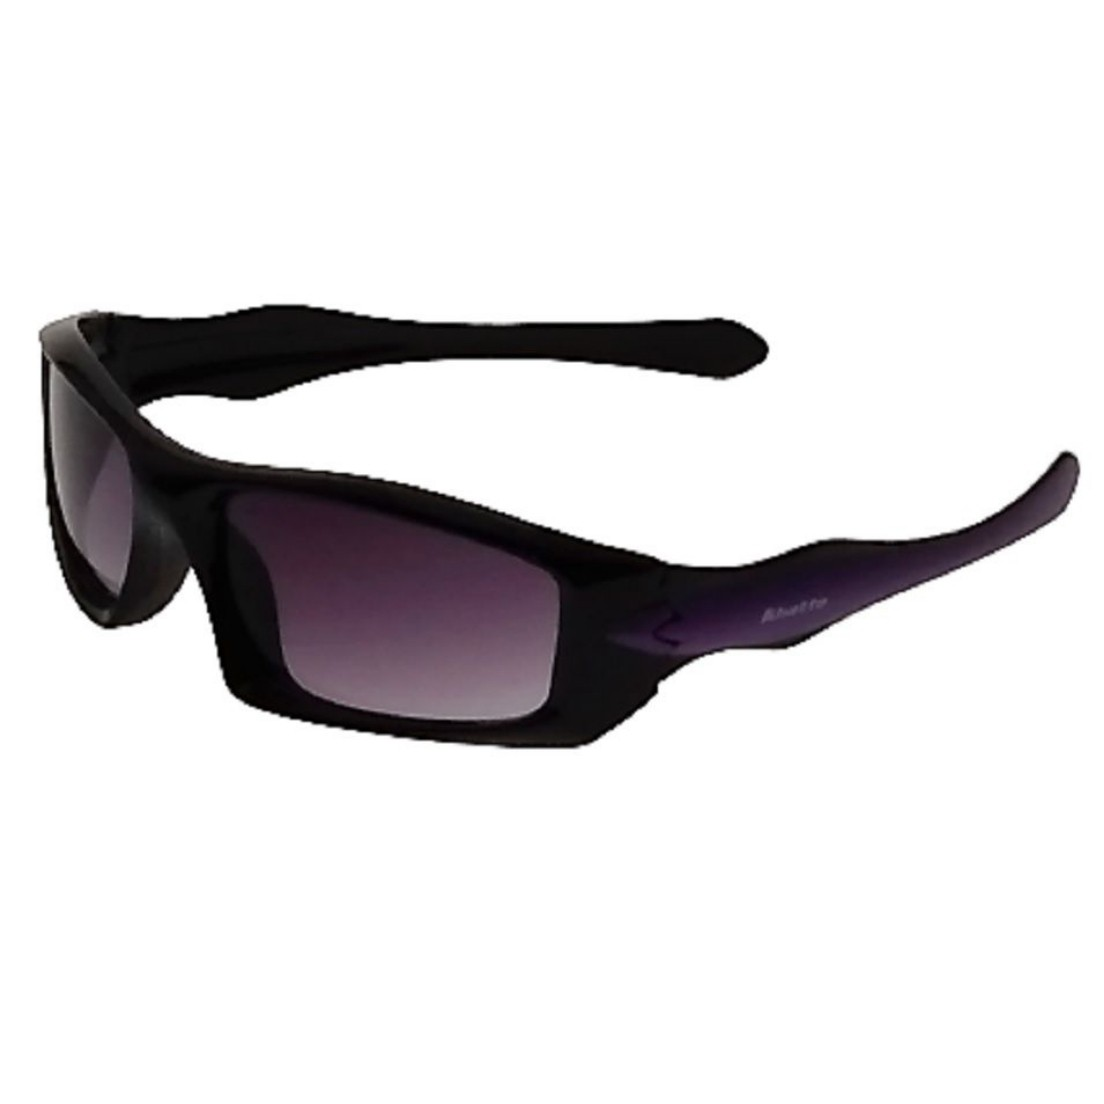 Óculos de Sol Khatto Kids Square Hércules - C005